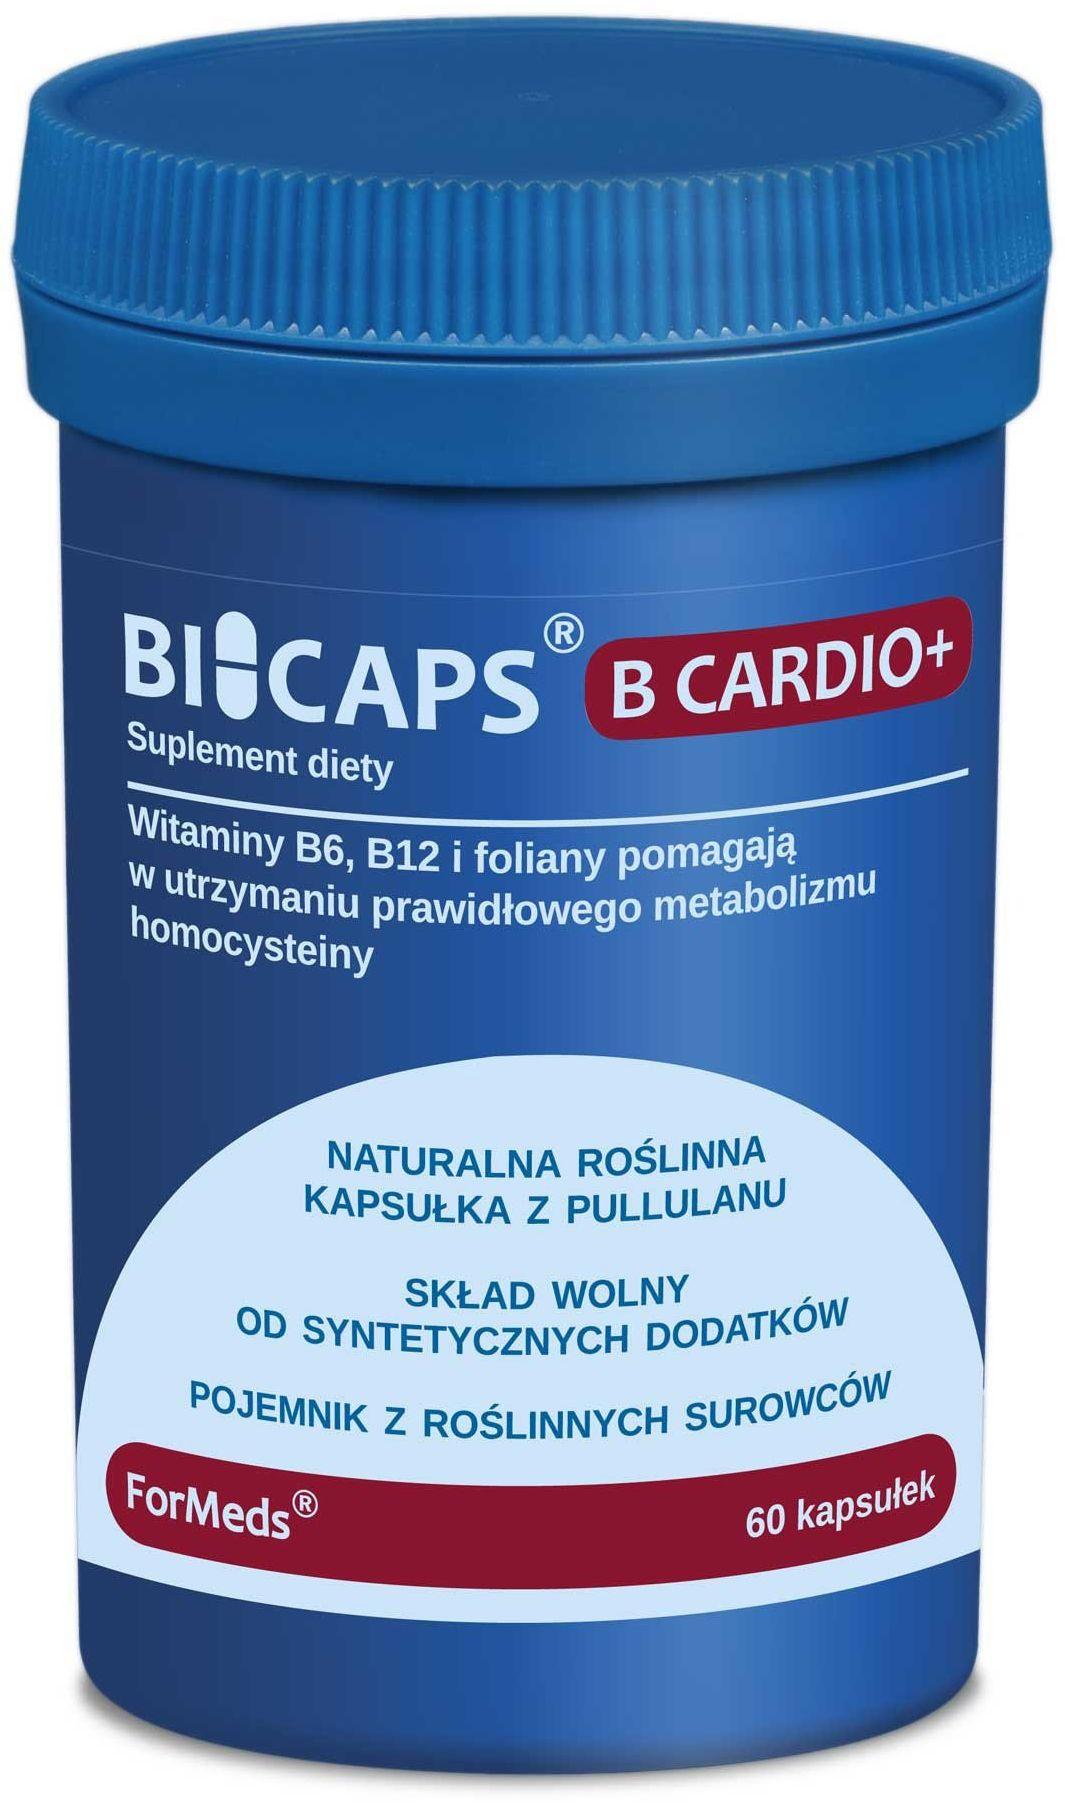 BICAPS B Cardio+ Witamina B6 B12 Foliany (60 kaps) ForMeds